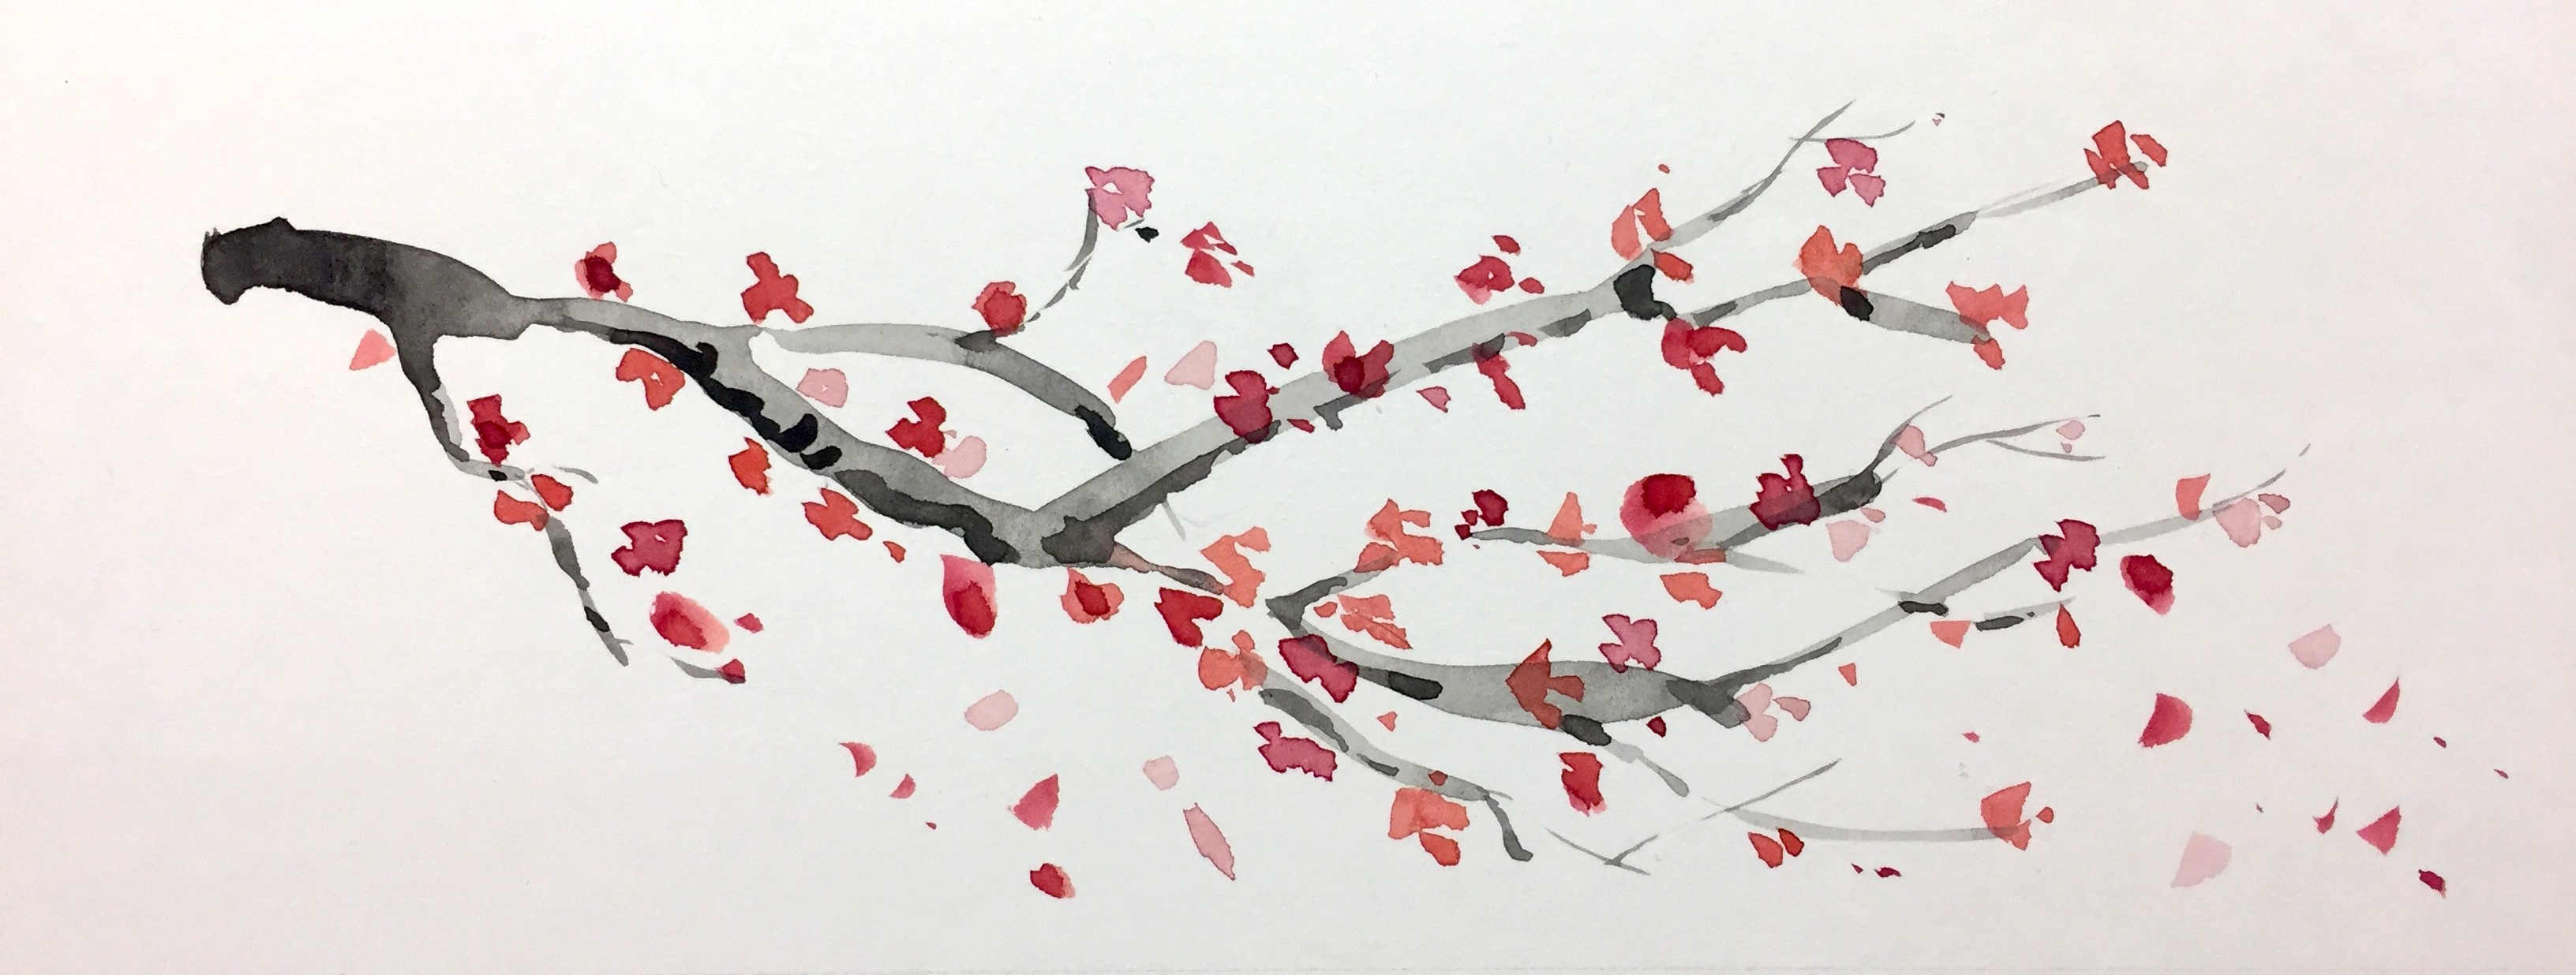 Rama de cerezo en flor